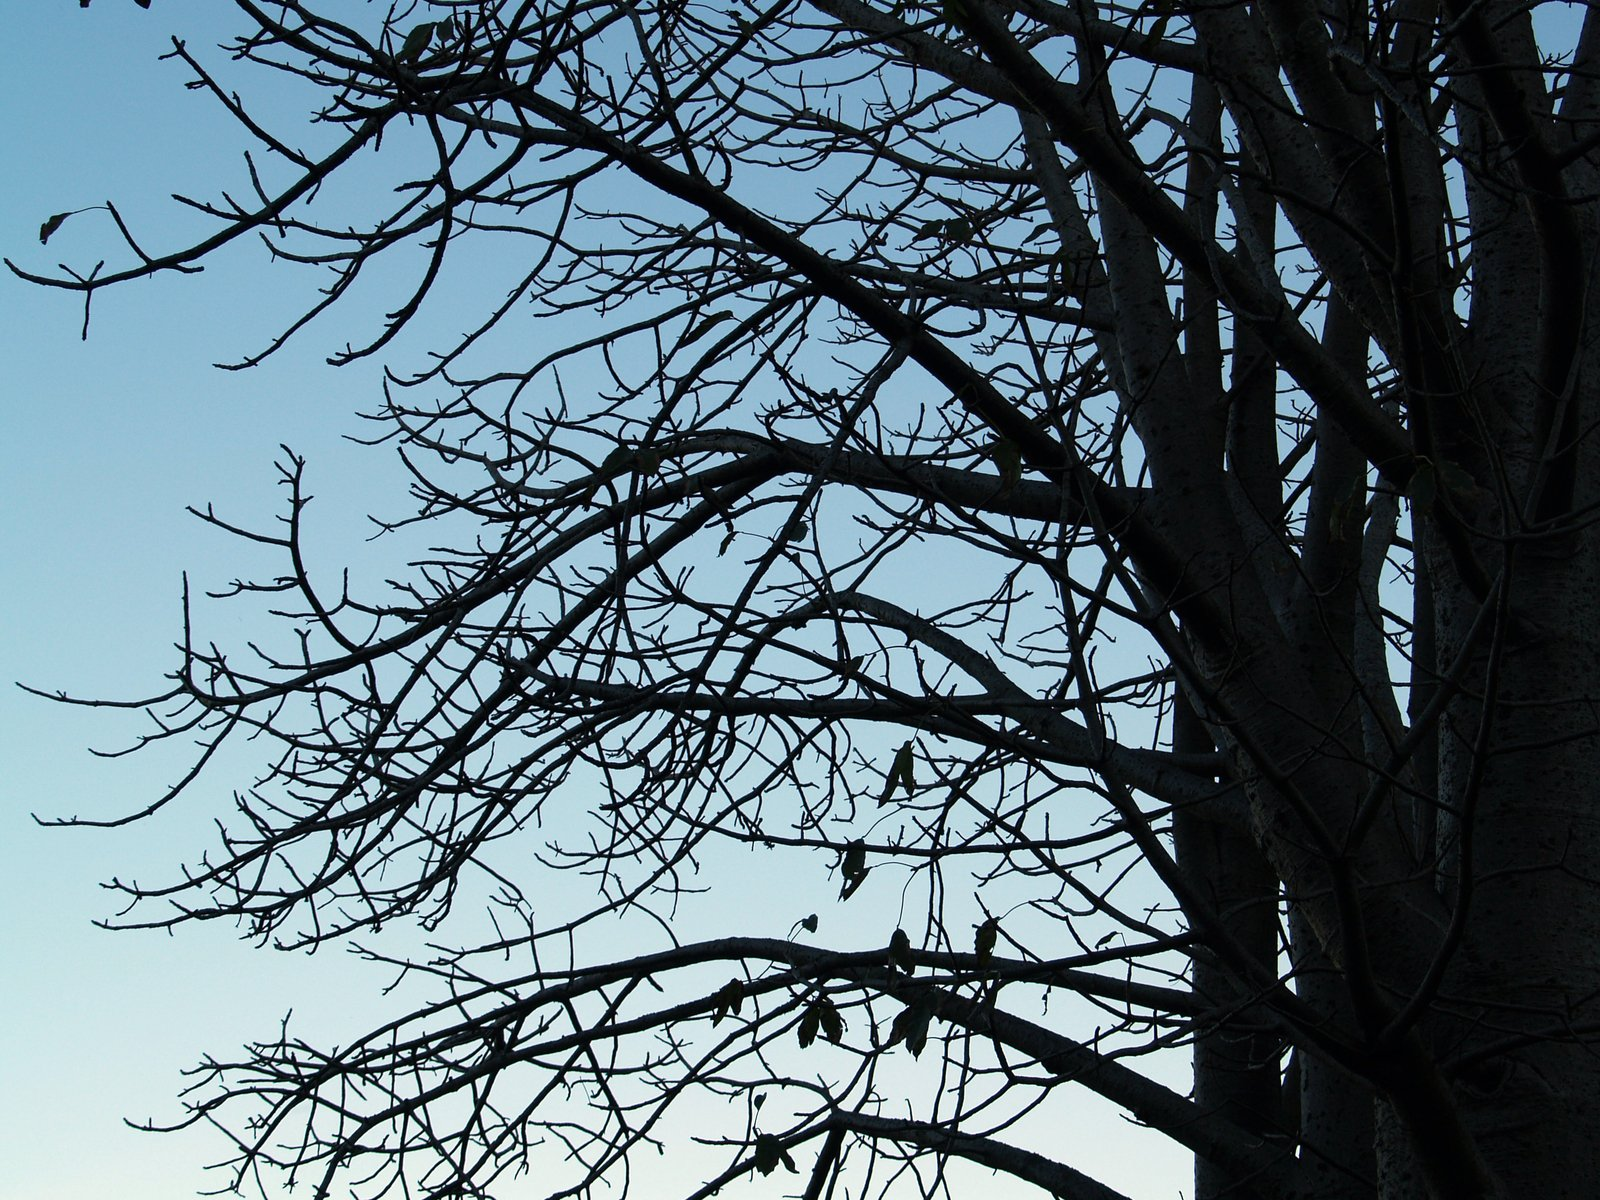 Free Baobab Baum Kontur Stock Photo - FreeImages.com